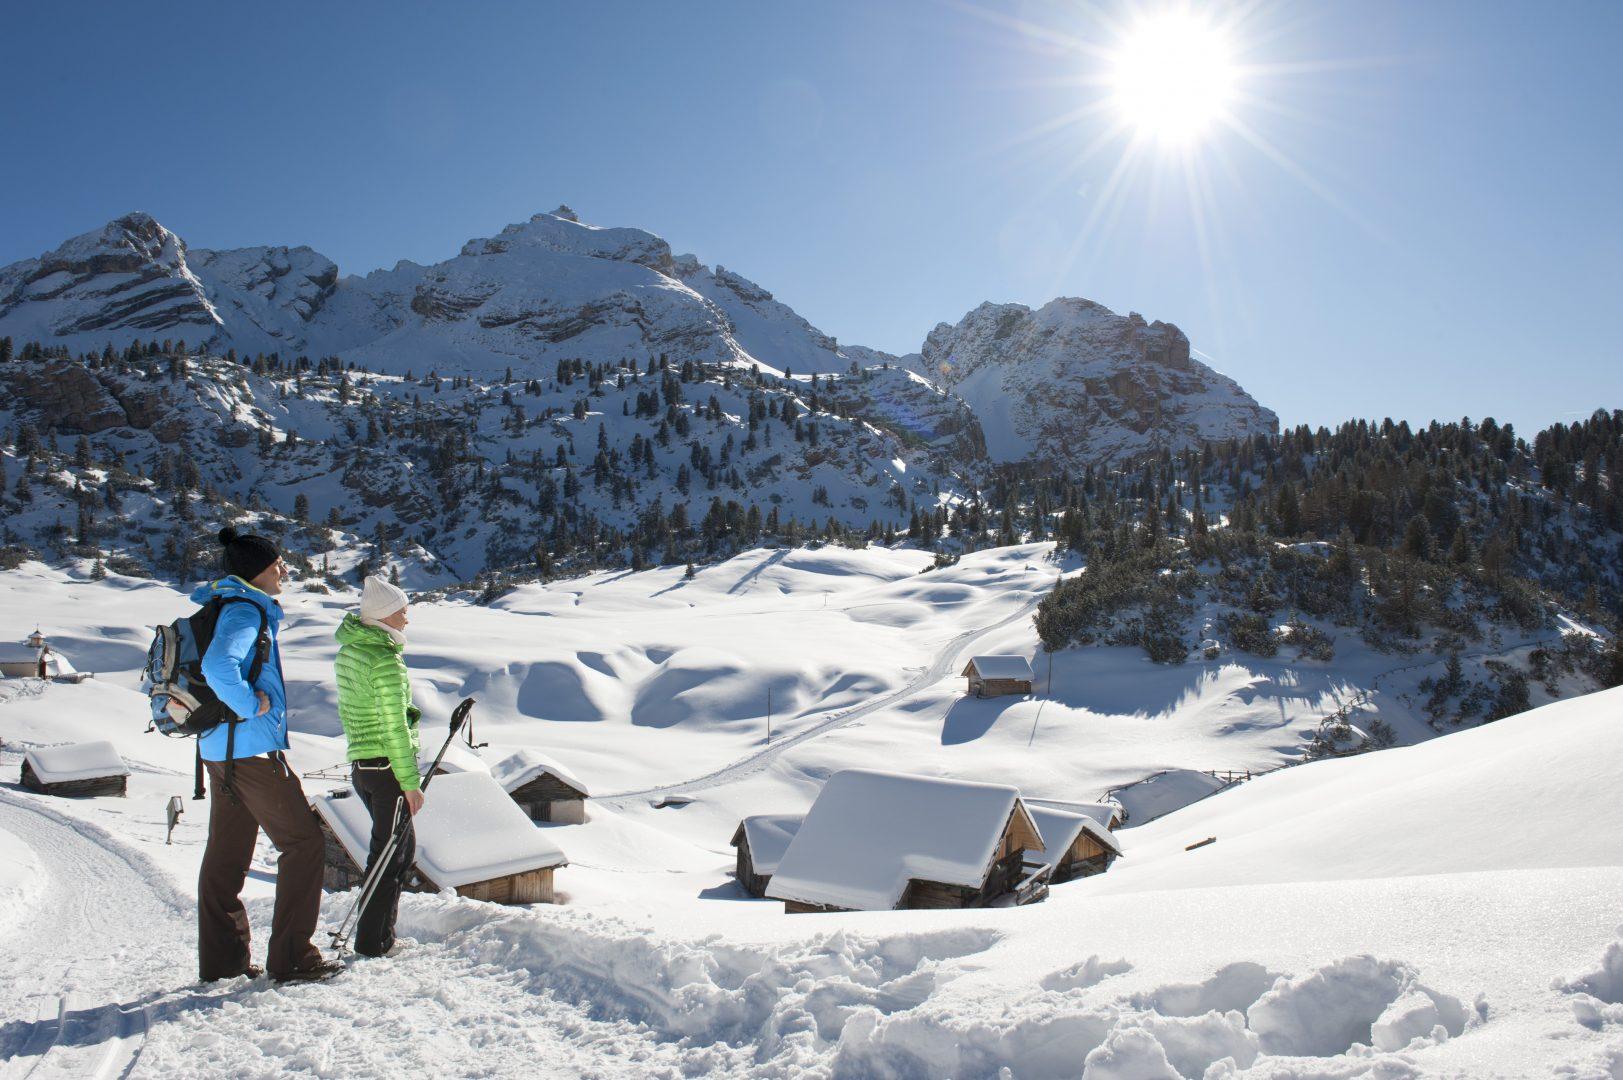 Winter_hiking_copyright_TVB_Kronplatz-Photo_Helmuth_Rier_20120221_4047_Sennes-Senes